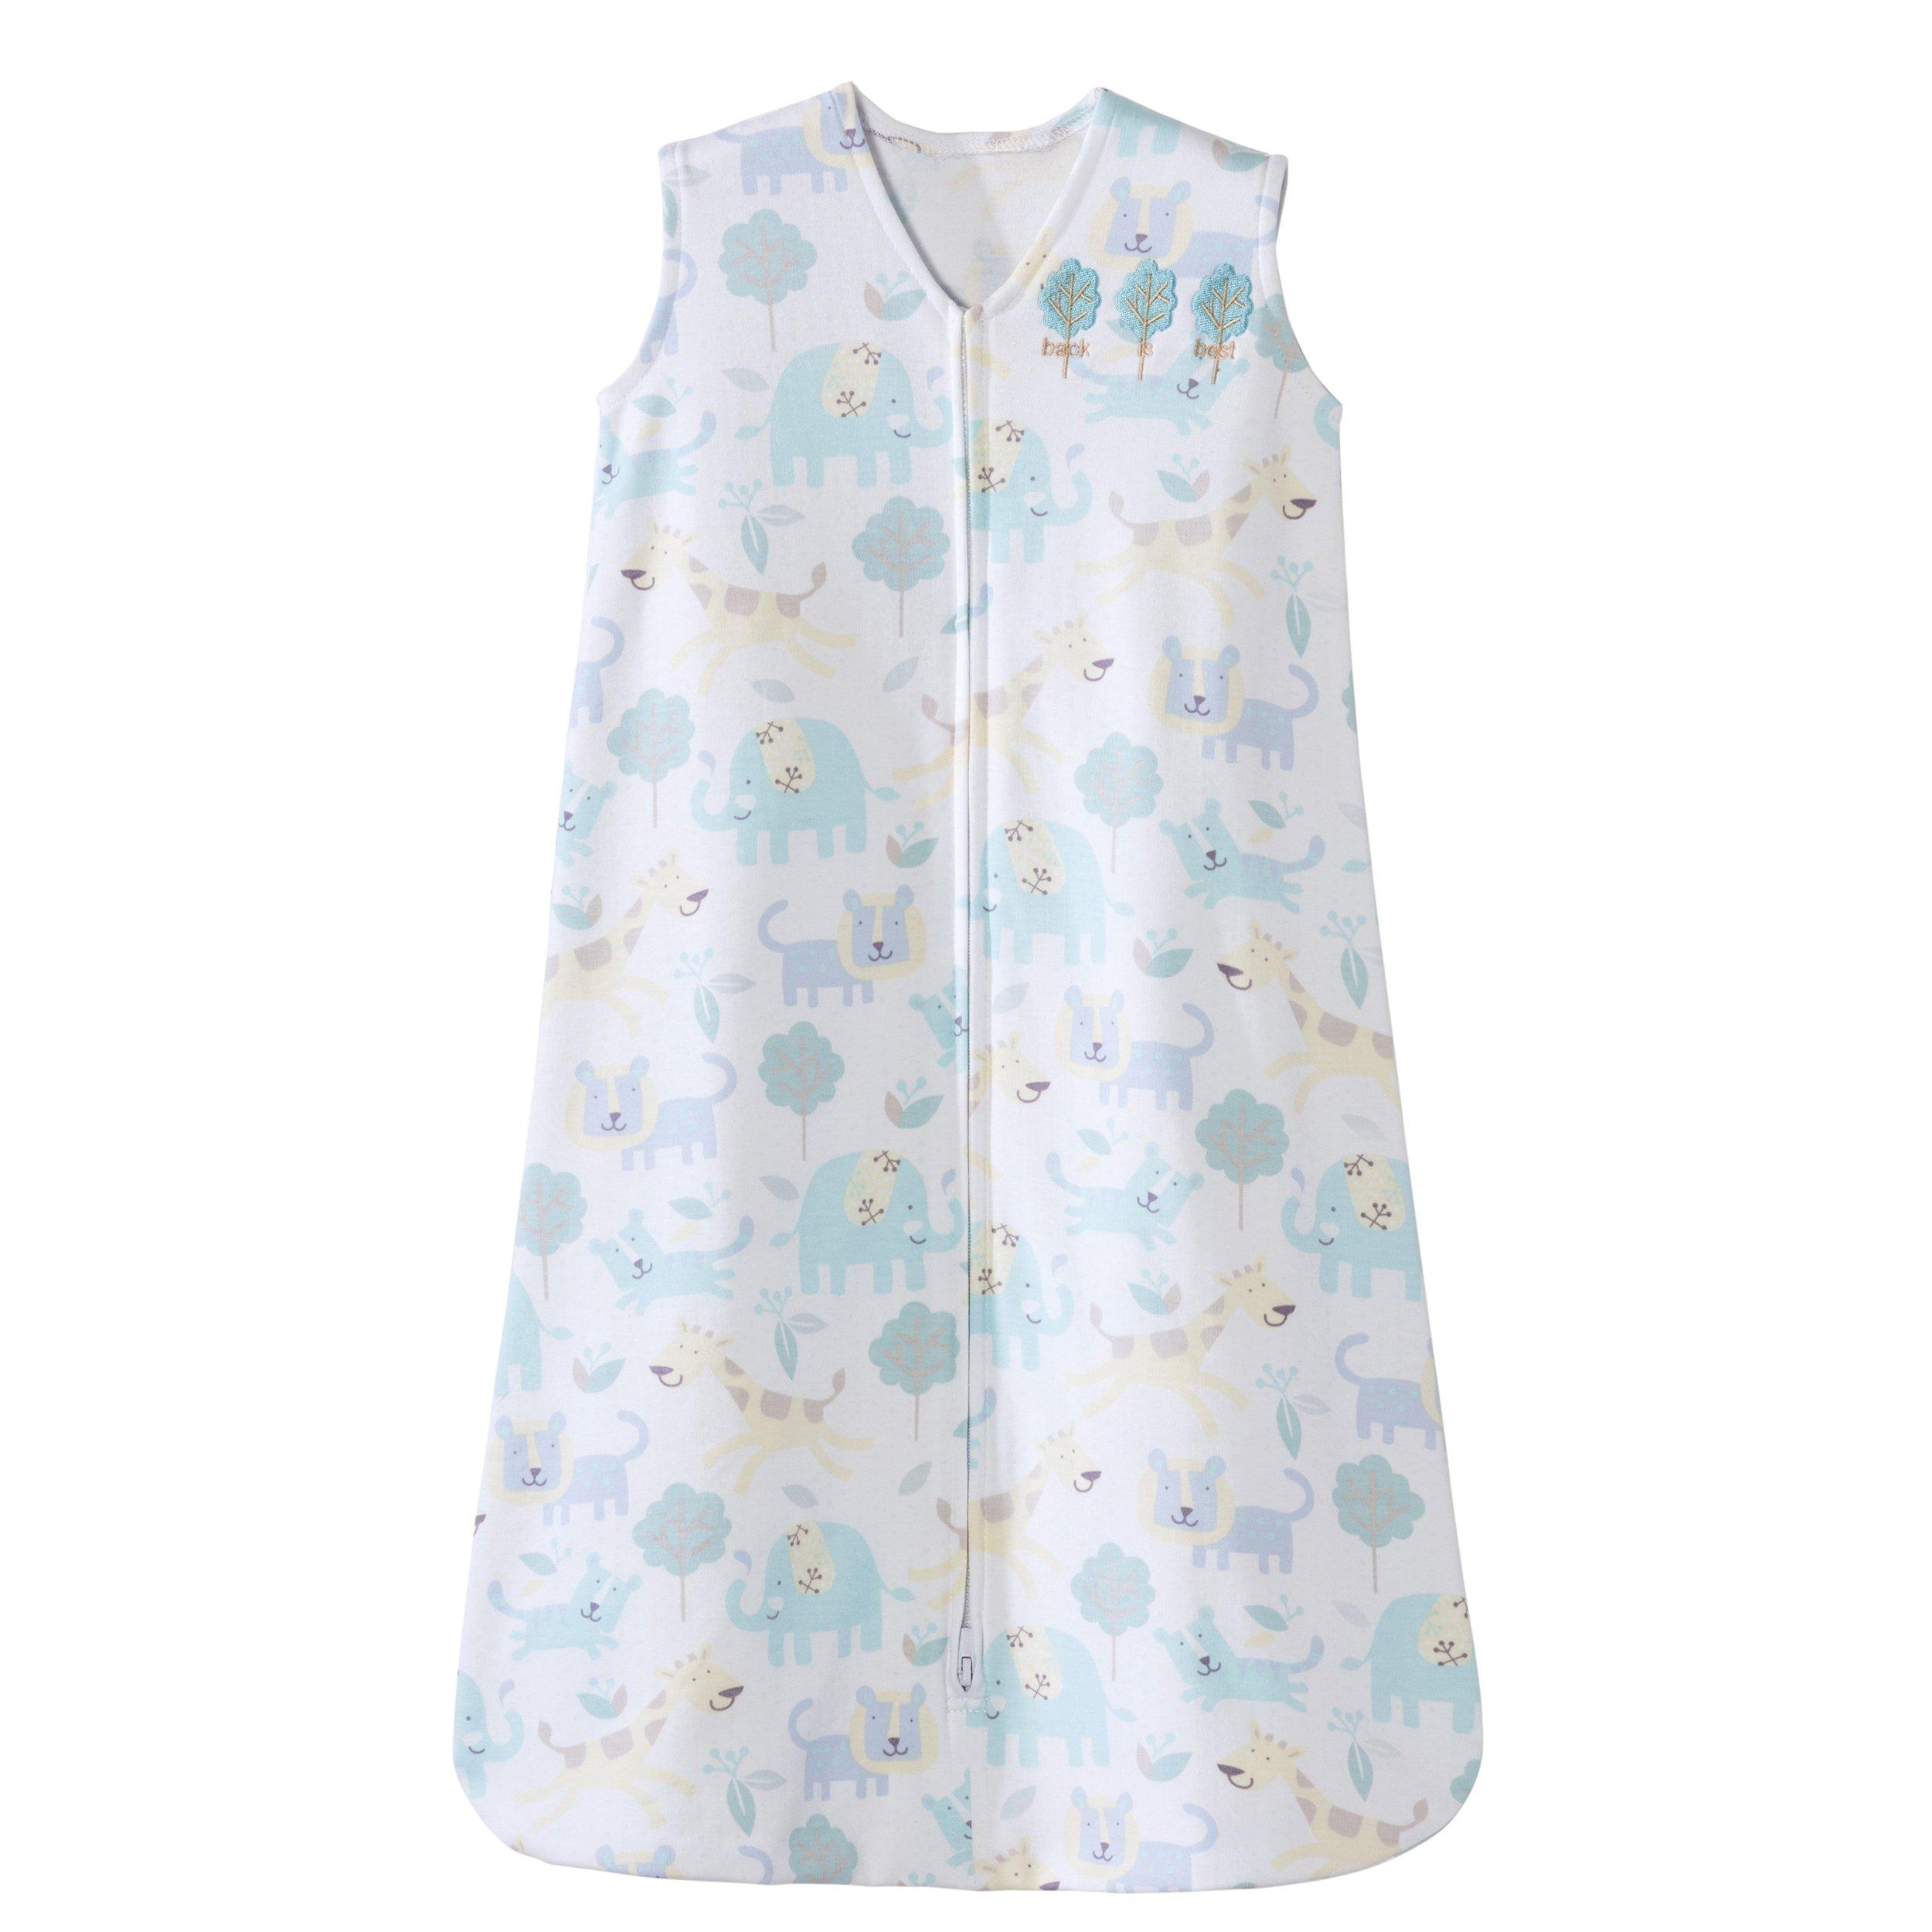 Halo Sleepsack 100% Cotton Wearable Blanket, Blue Animal, Medium